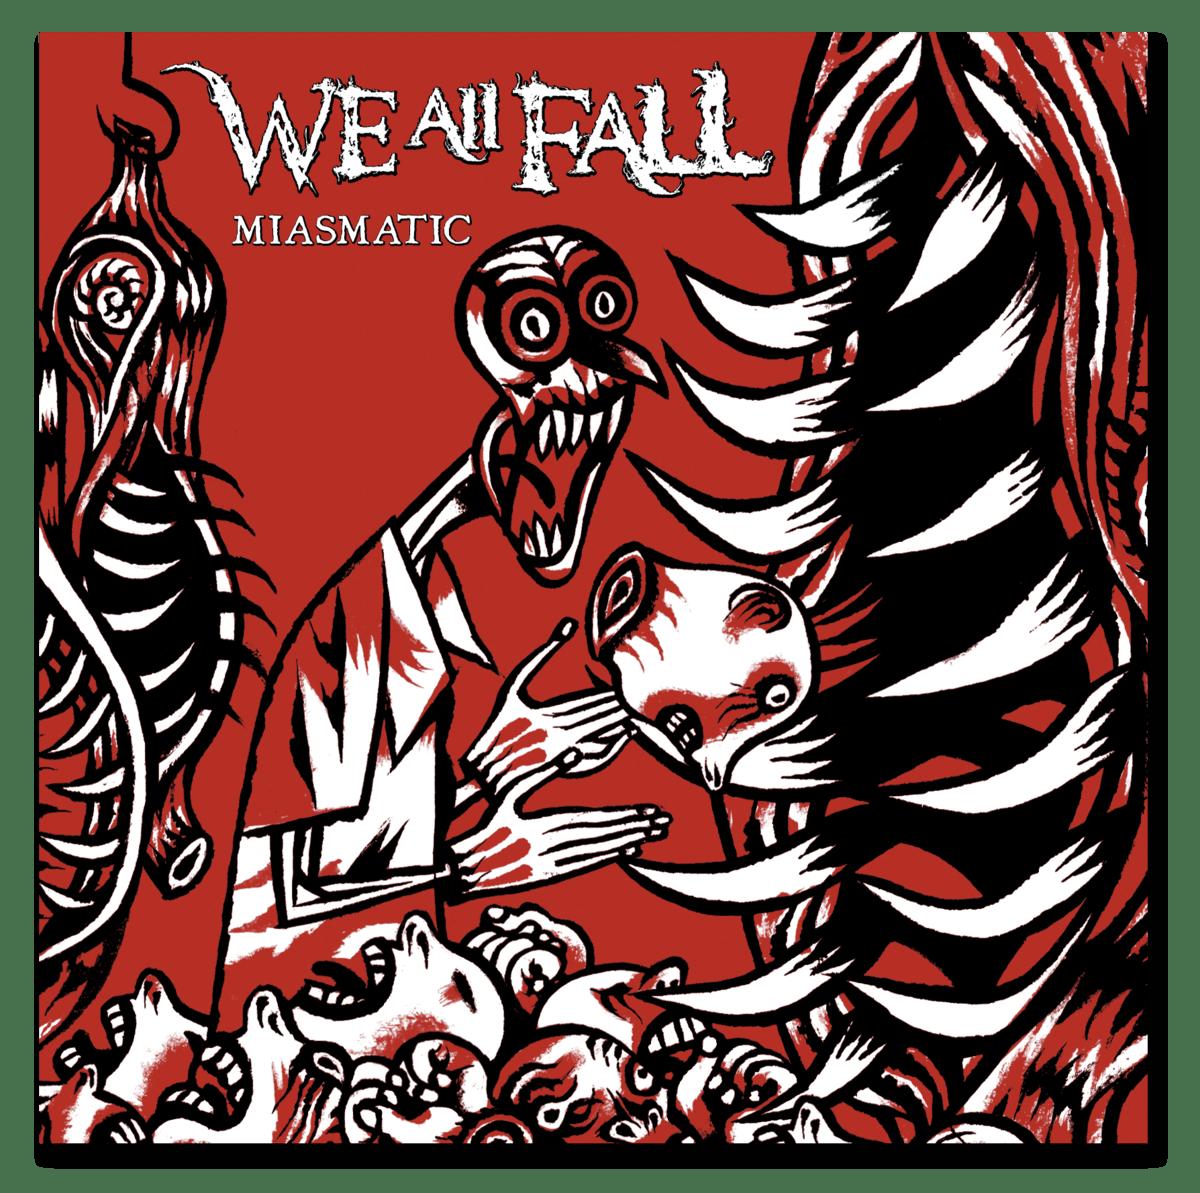 WE ALL FALL – Miasmatic, 2014